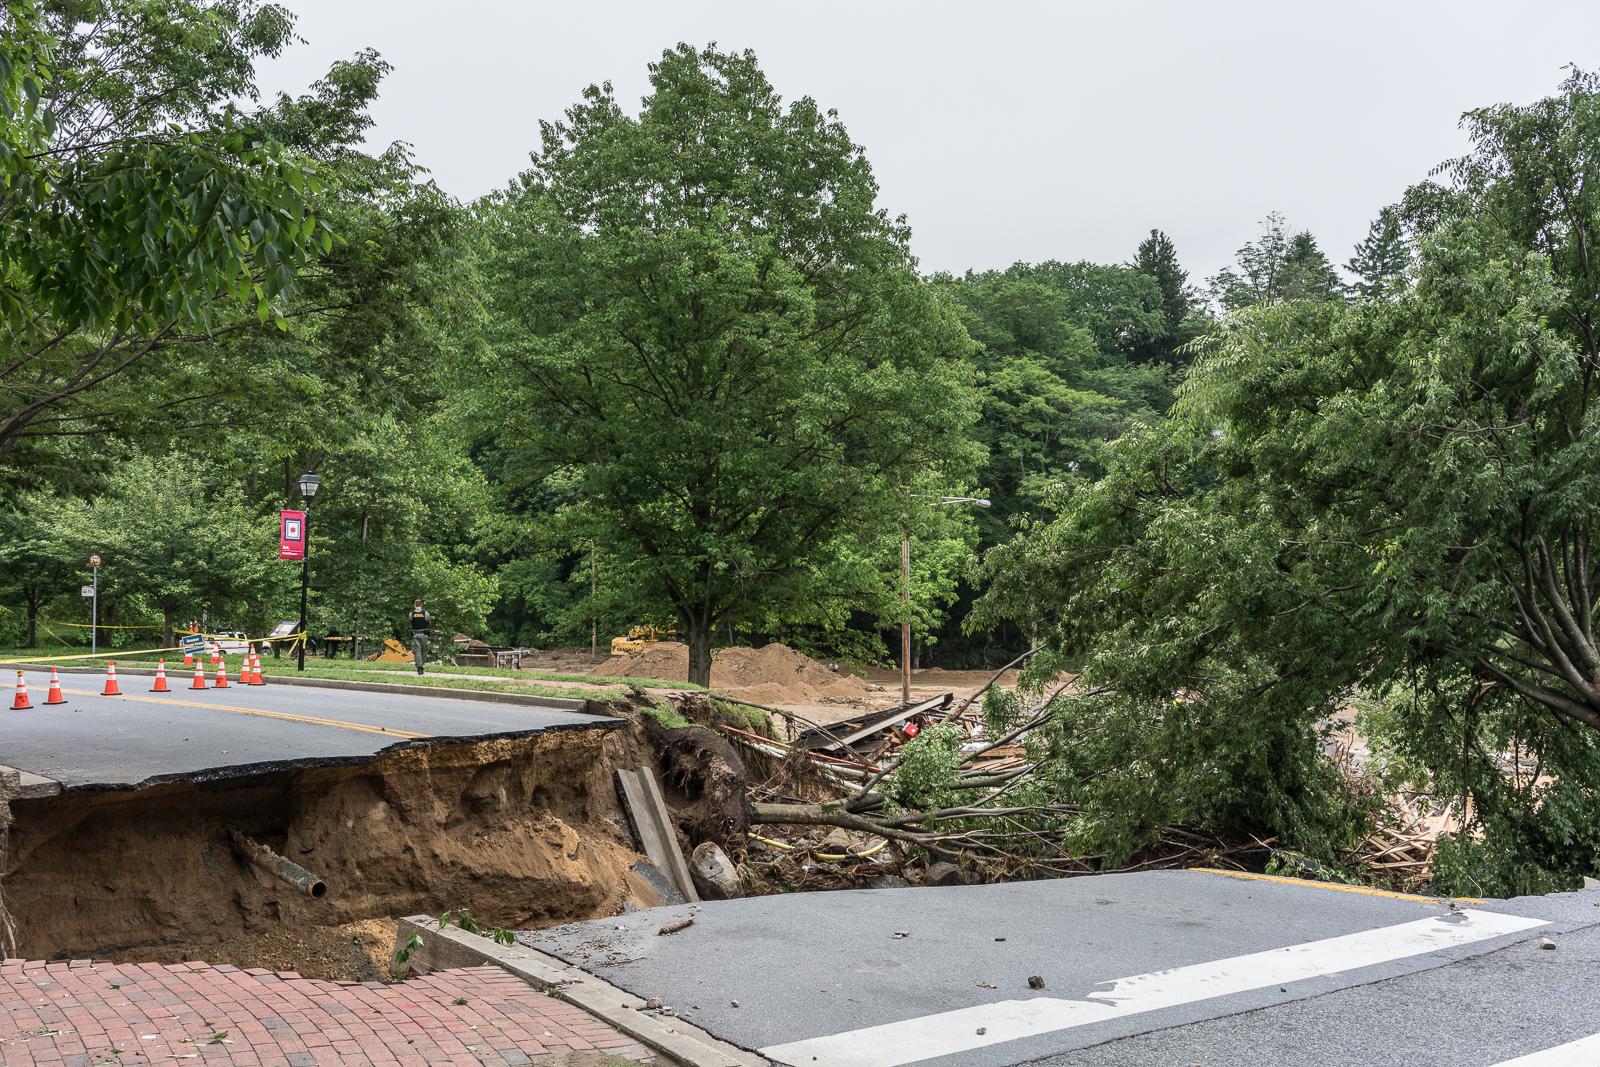 Road Broken by Flooding, Ellicott City, Maryland, 2018